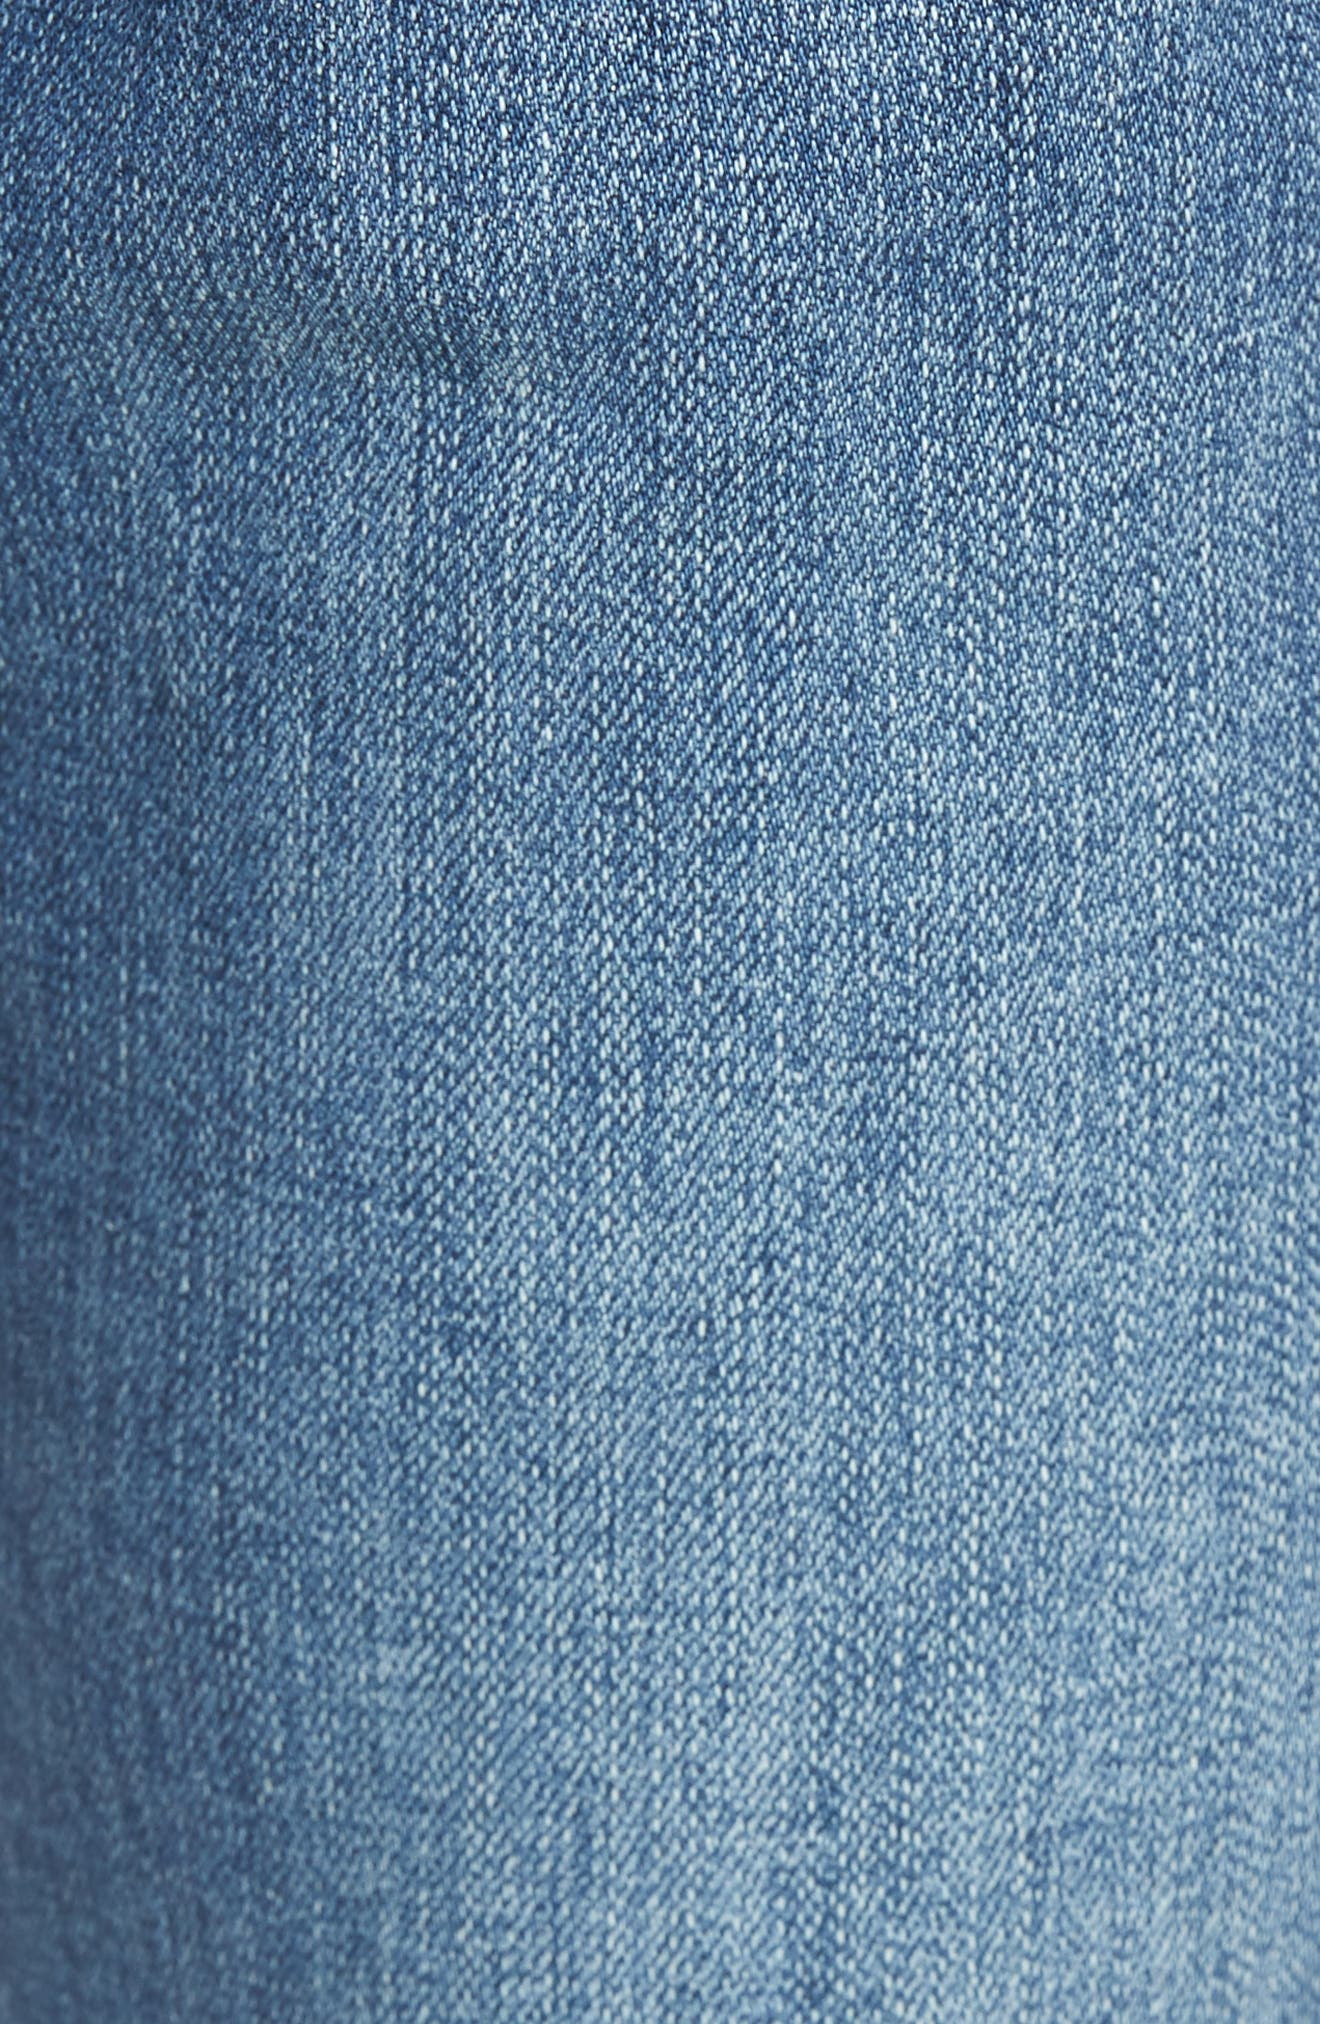 Jeans Co. Bond Skinny Fit Jeans,                             Alternate thumbnail 5, color,                             Bryson Vintage Medium